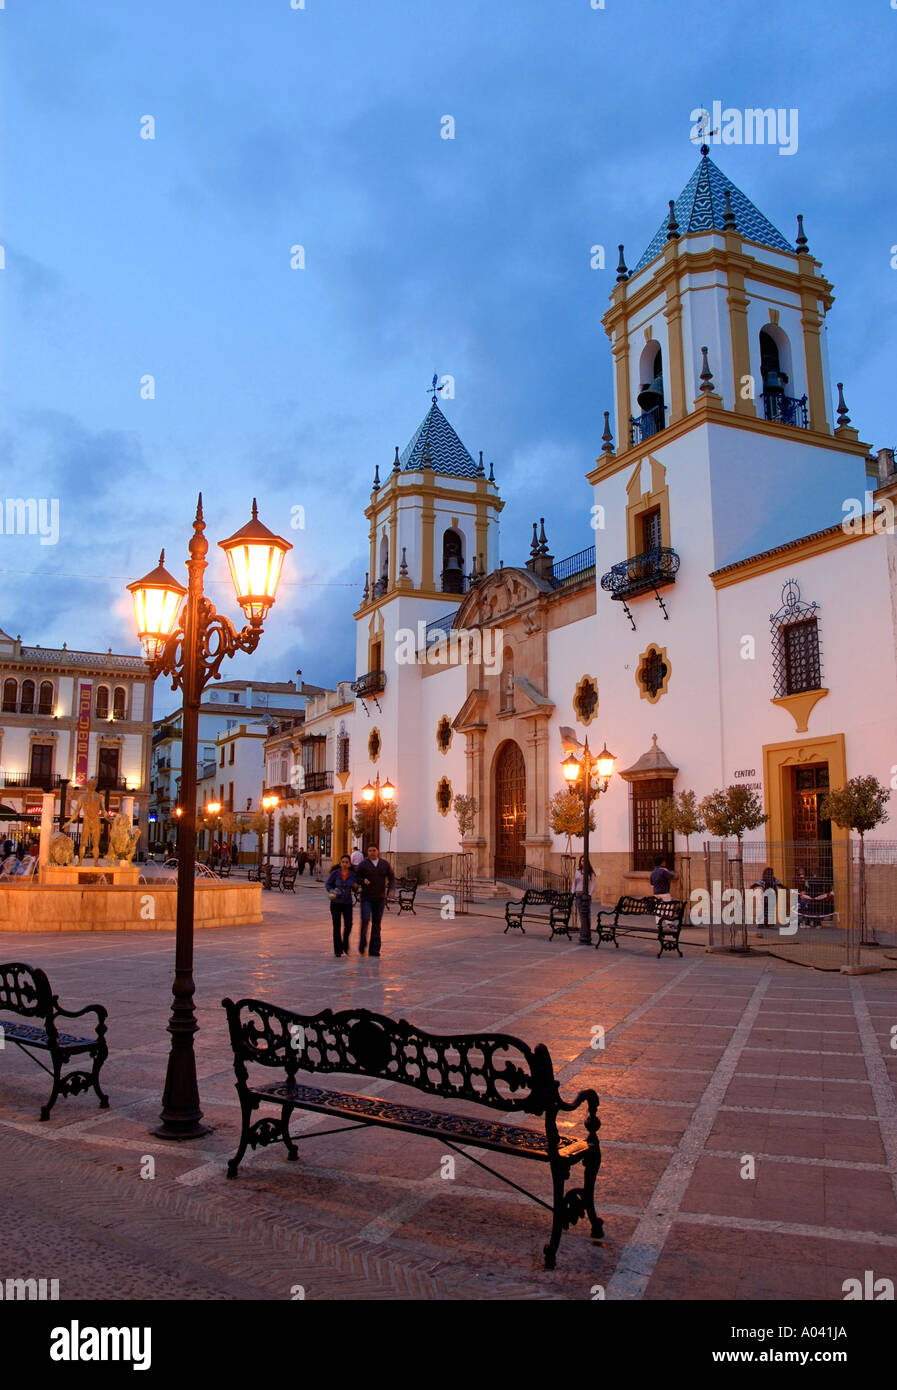 Plaza del Socorro, Ronda, Provinz Malaga, Andalusien, Spanien Stockbild